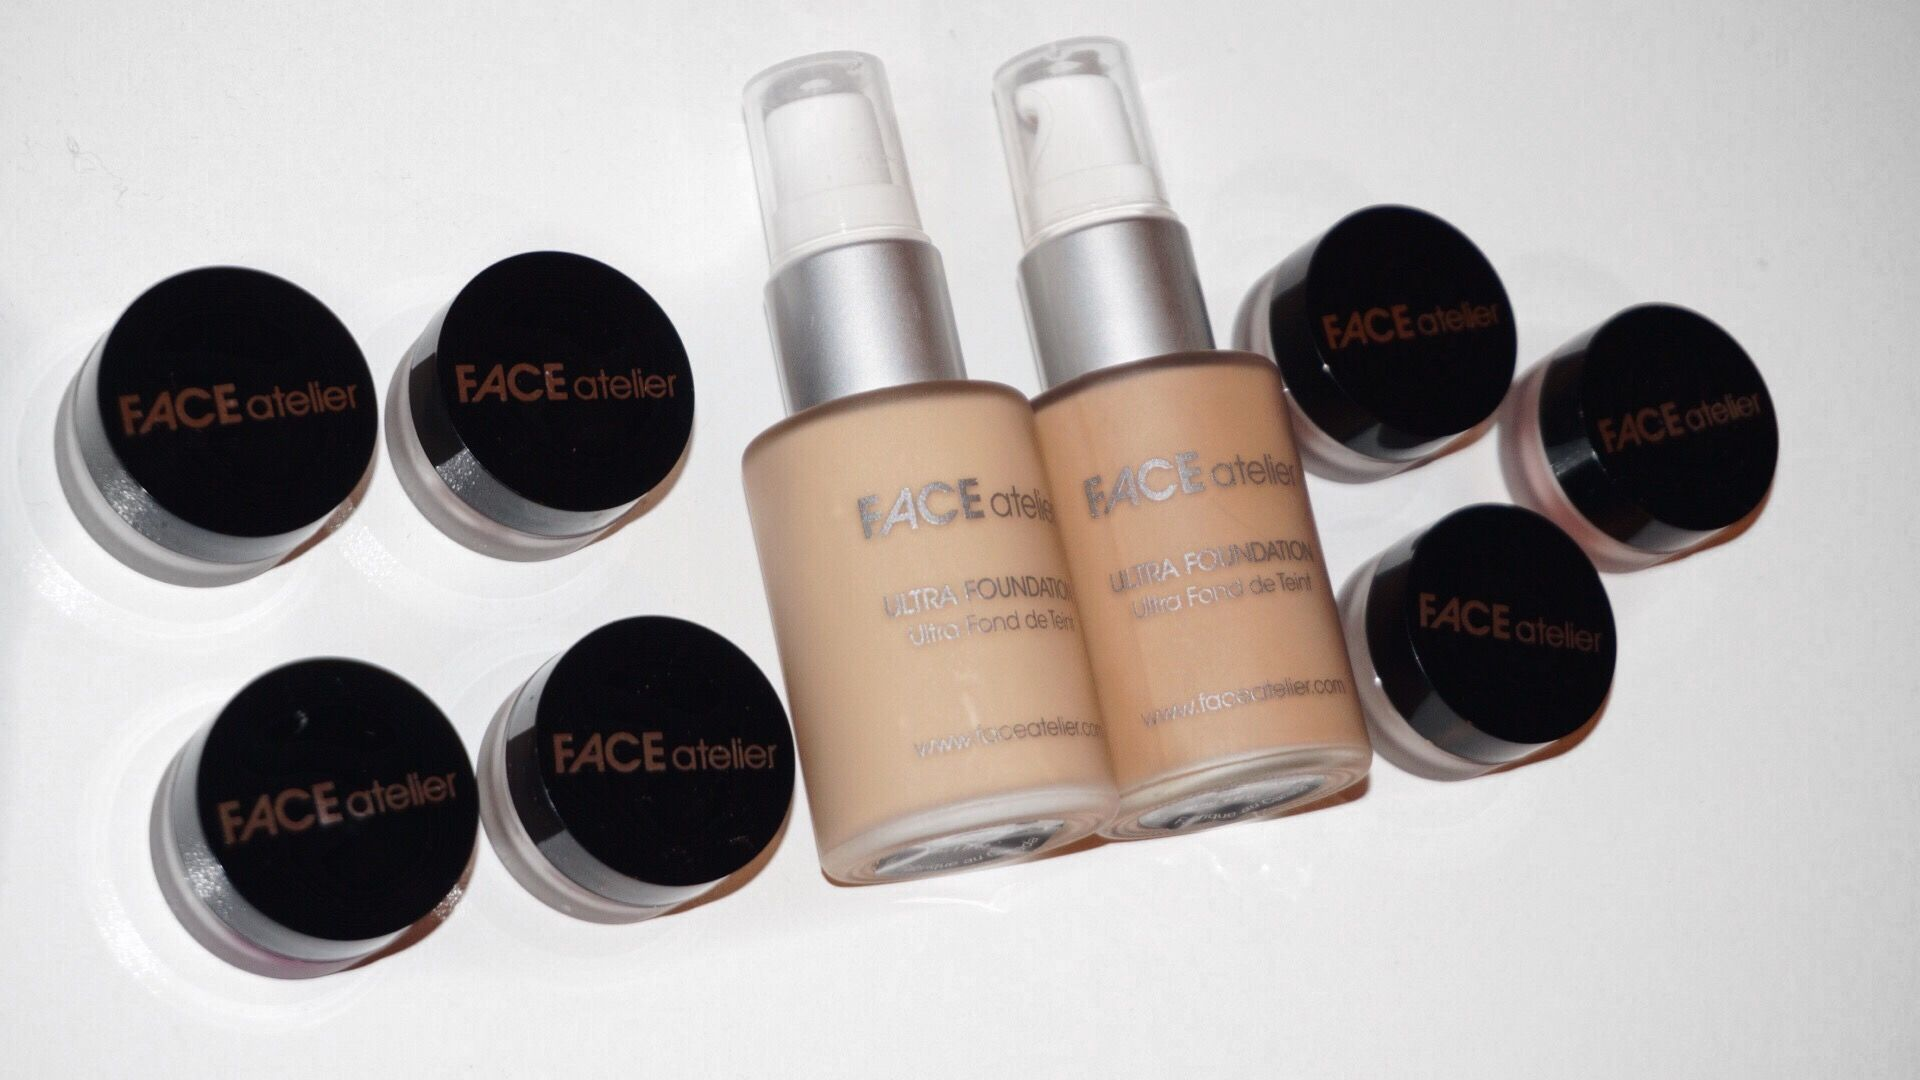 FACE atelier Sophisticated & Versatile Makeup